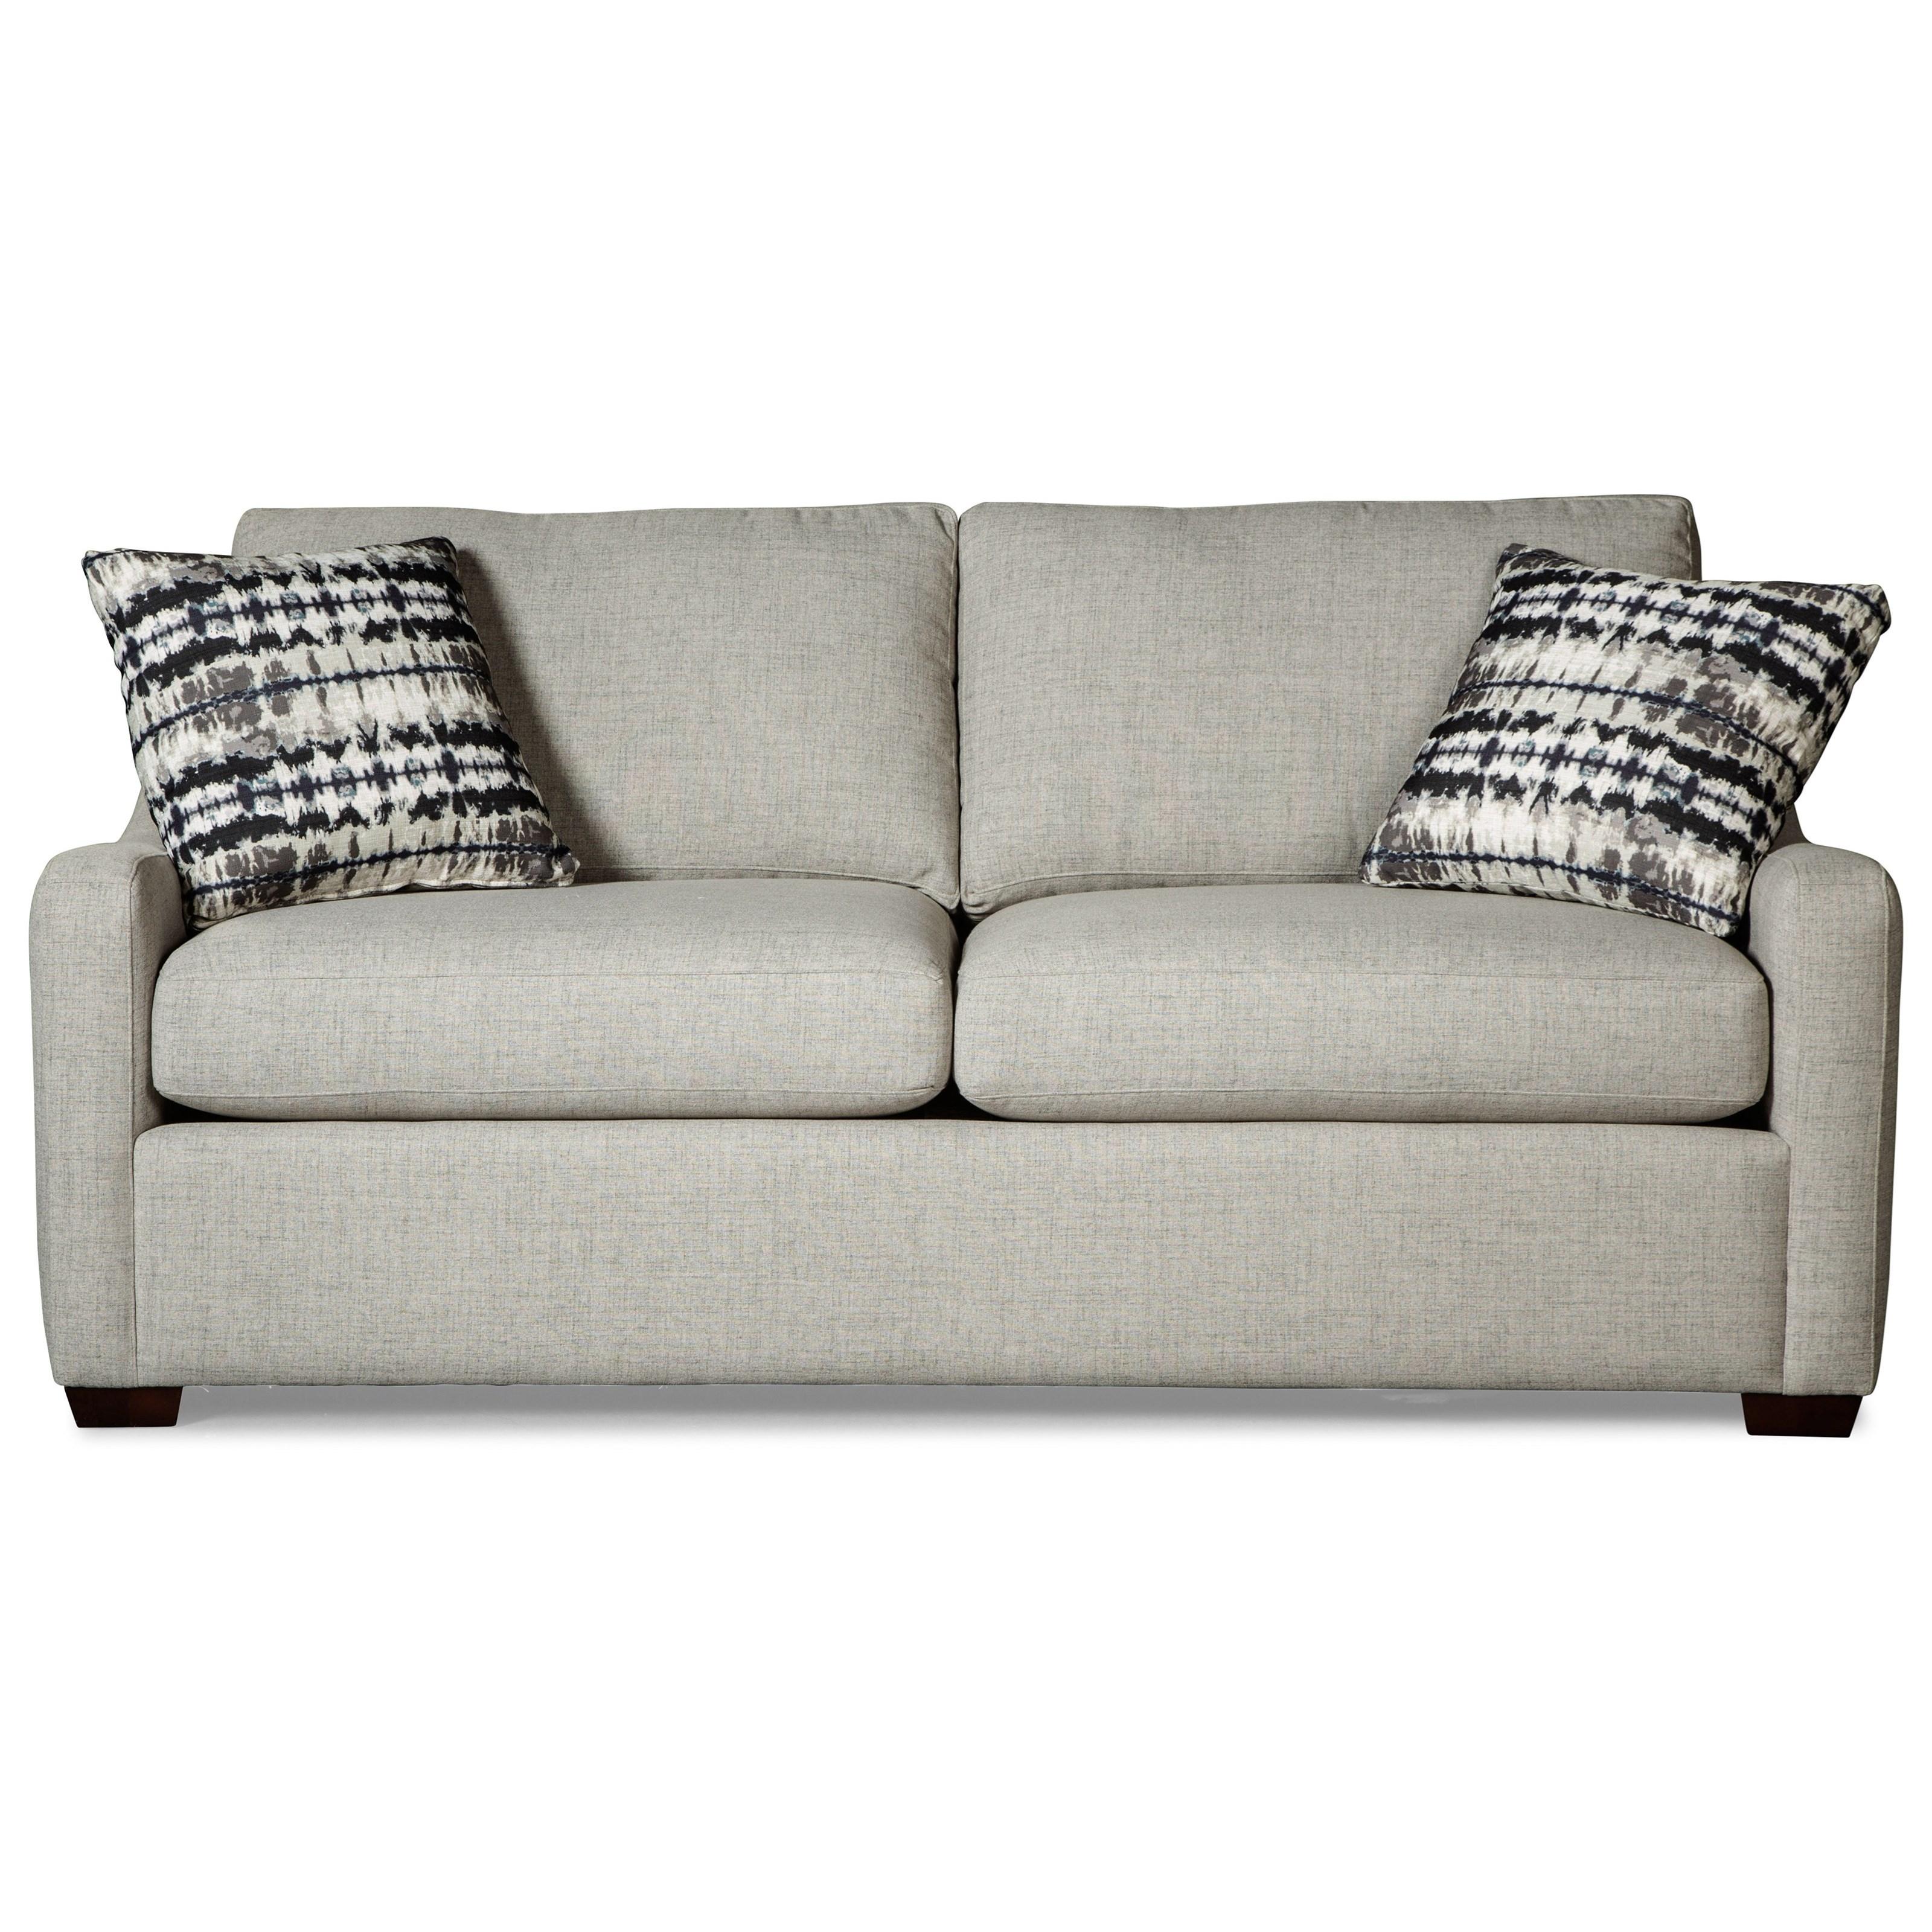 Craftmaster 7643Queen Sleeper Sofa With Memory Foam Mattress ...